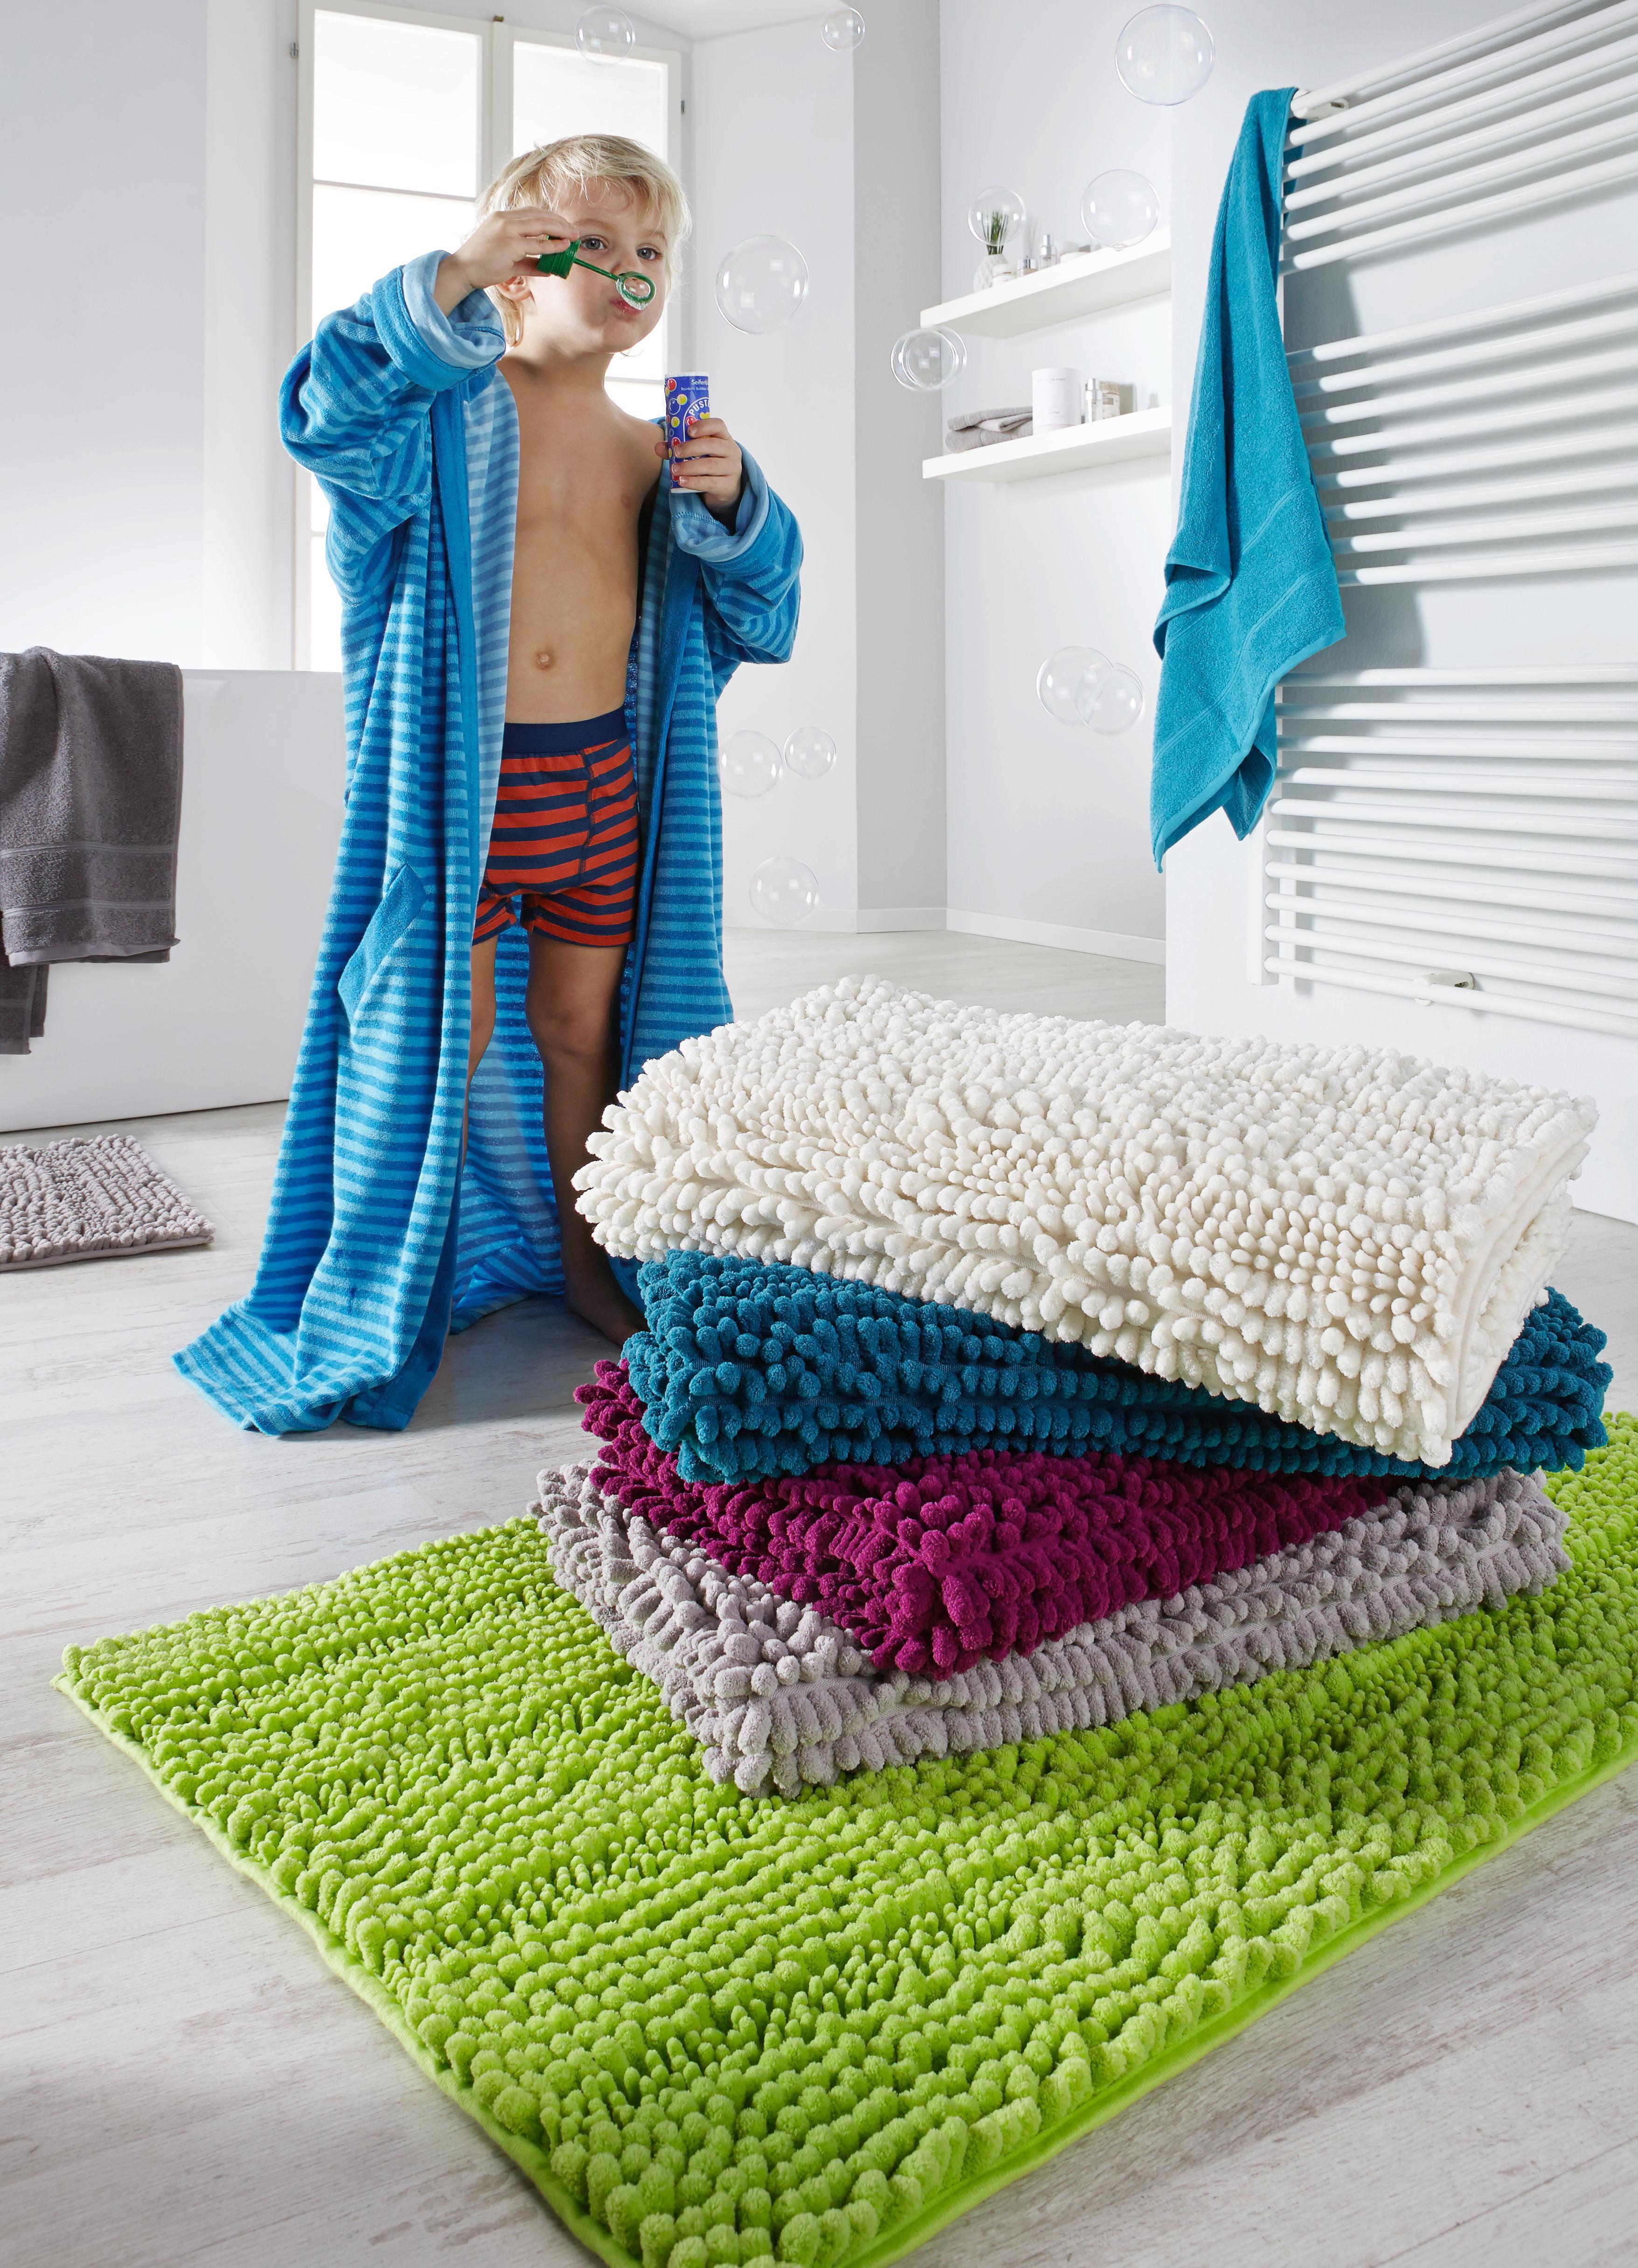 Badematte Uwe ca. 60x100cm - Grün, Textil (60/100cm) - MÖMAX modern living